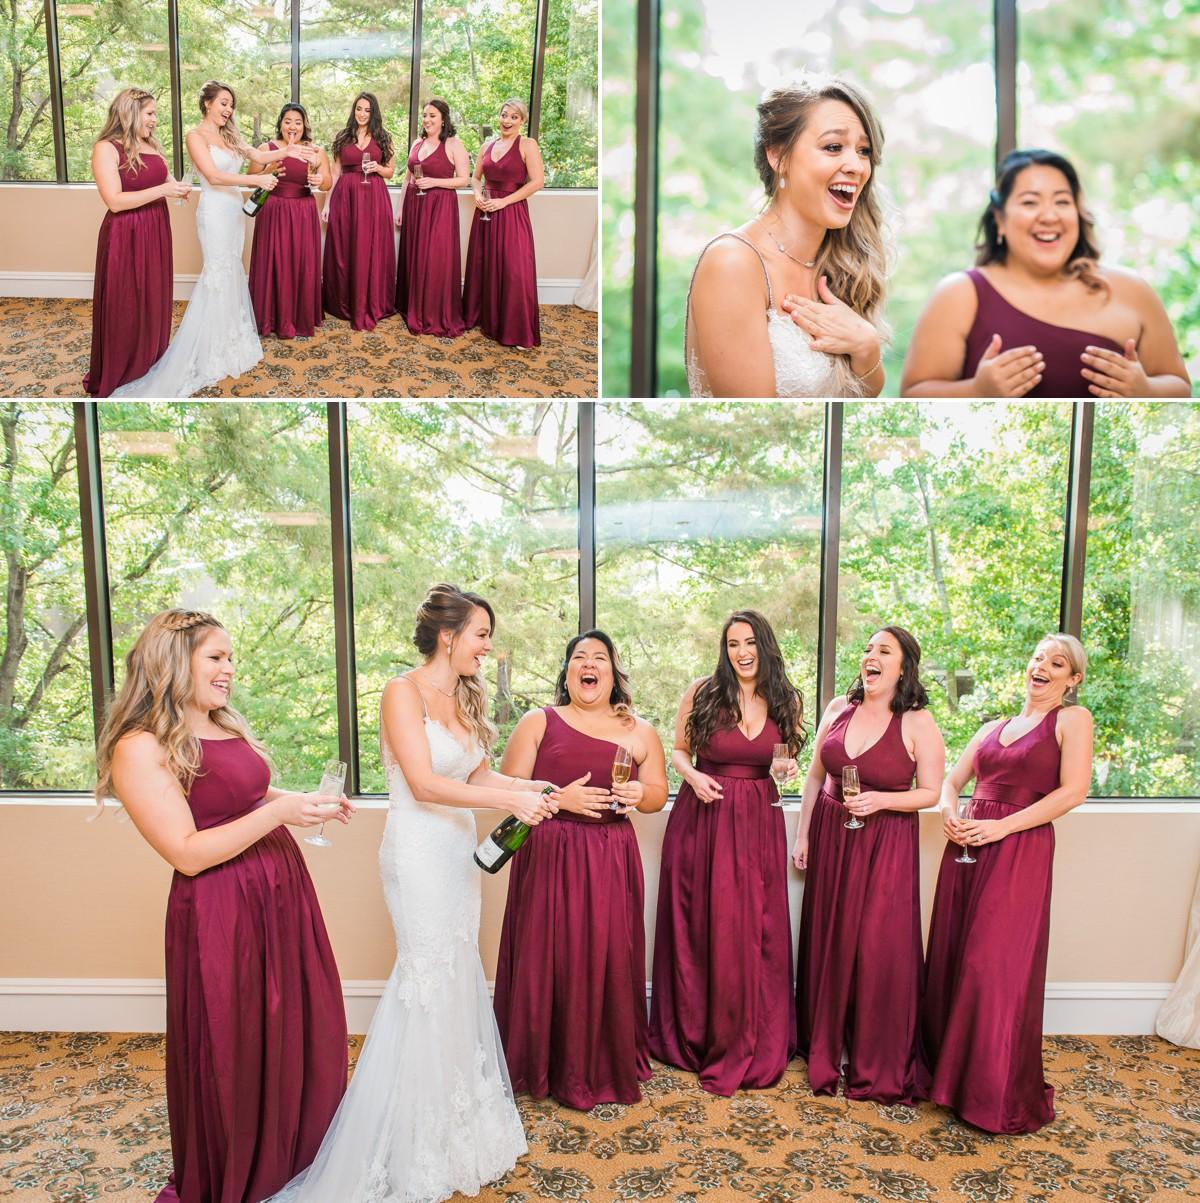 Manor House Wedding at The Houstonian Hotel Bridesmaids toast